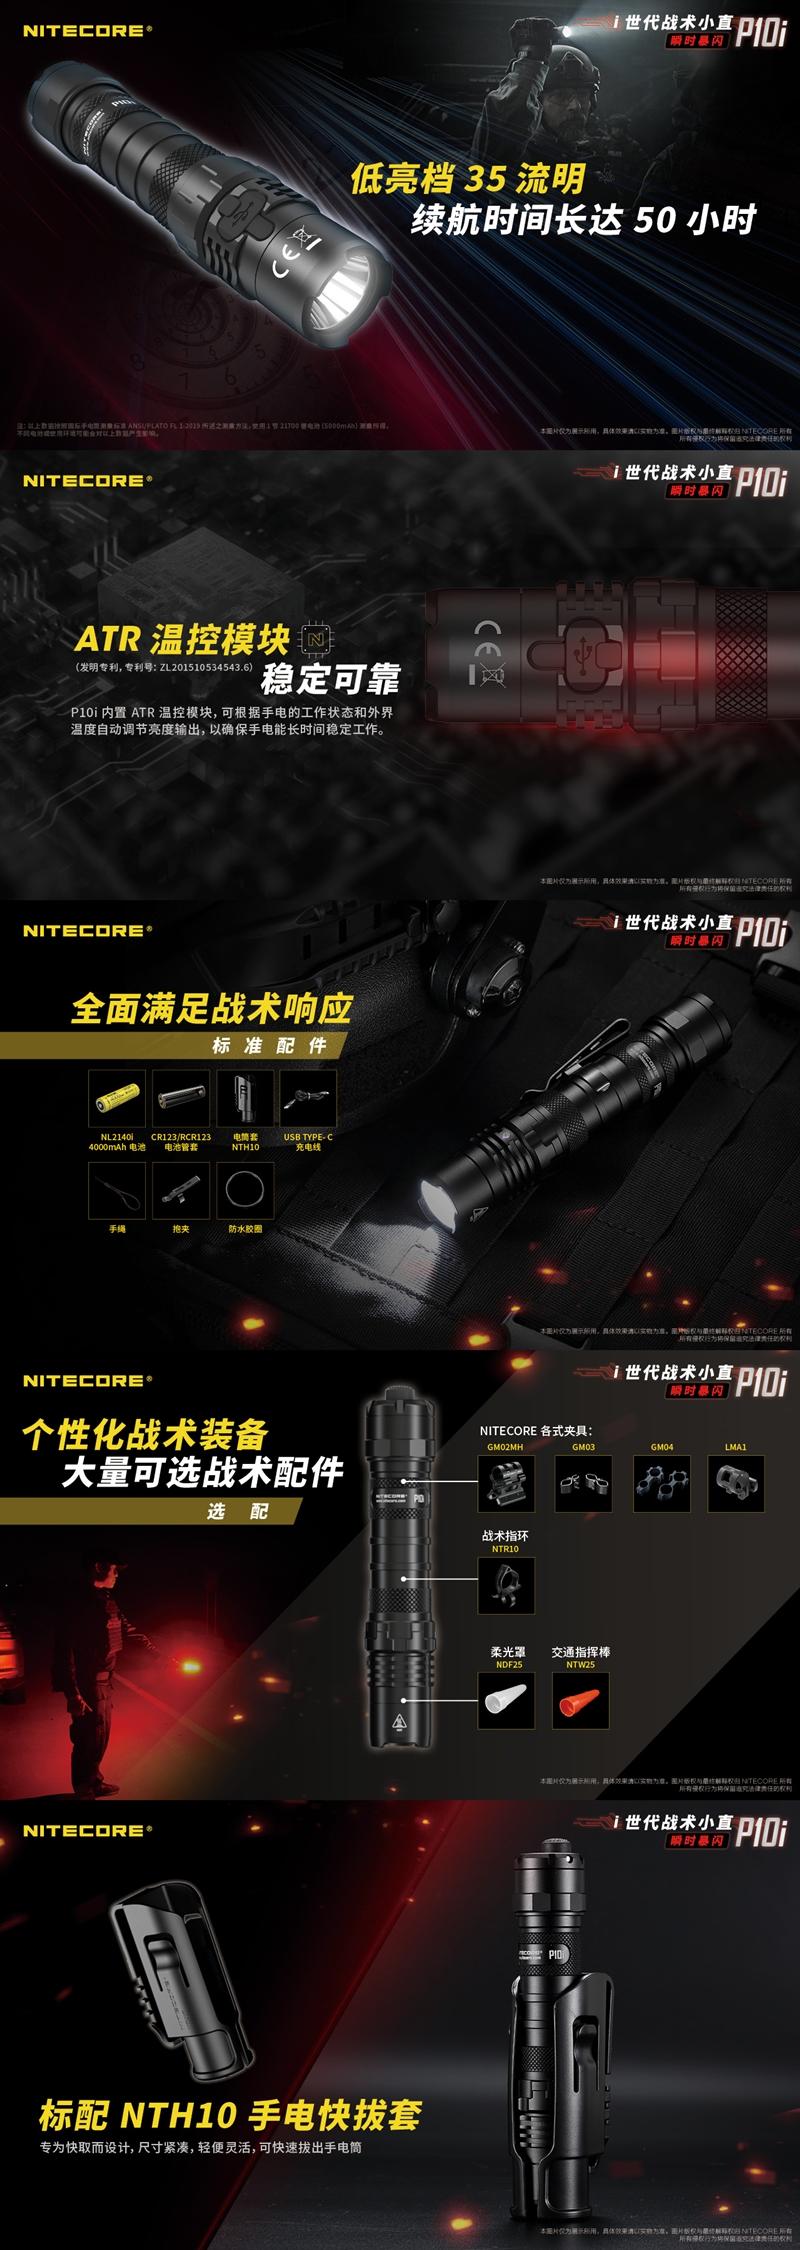 4-NITECORE I4000R 4400流明 附原廠電池 USB充電 MOLLE快拆套 NTR10 戰術指環 (3)